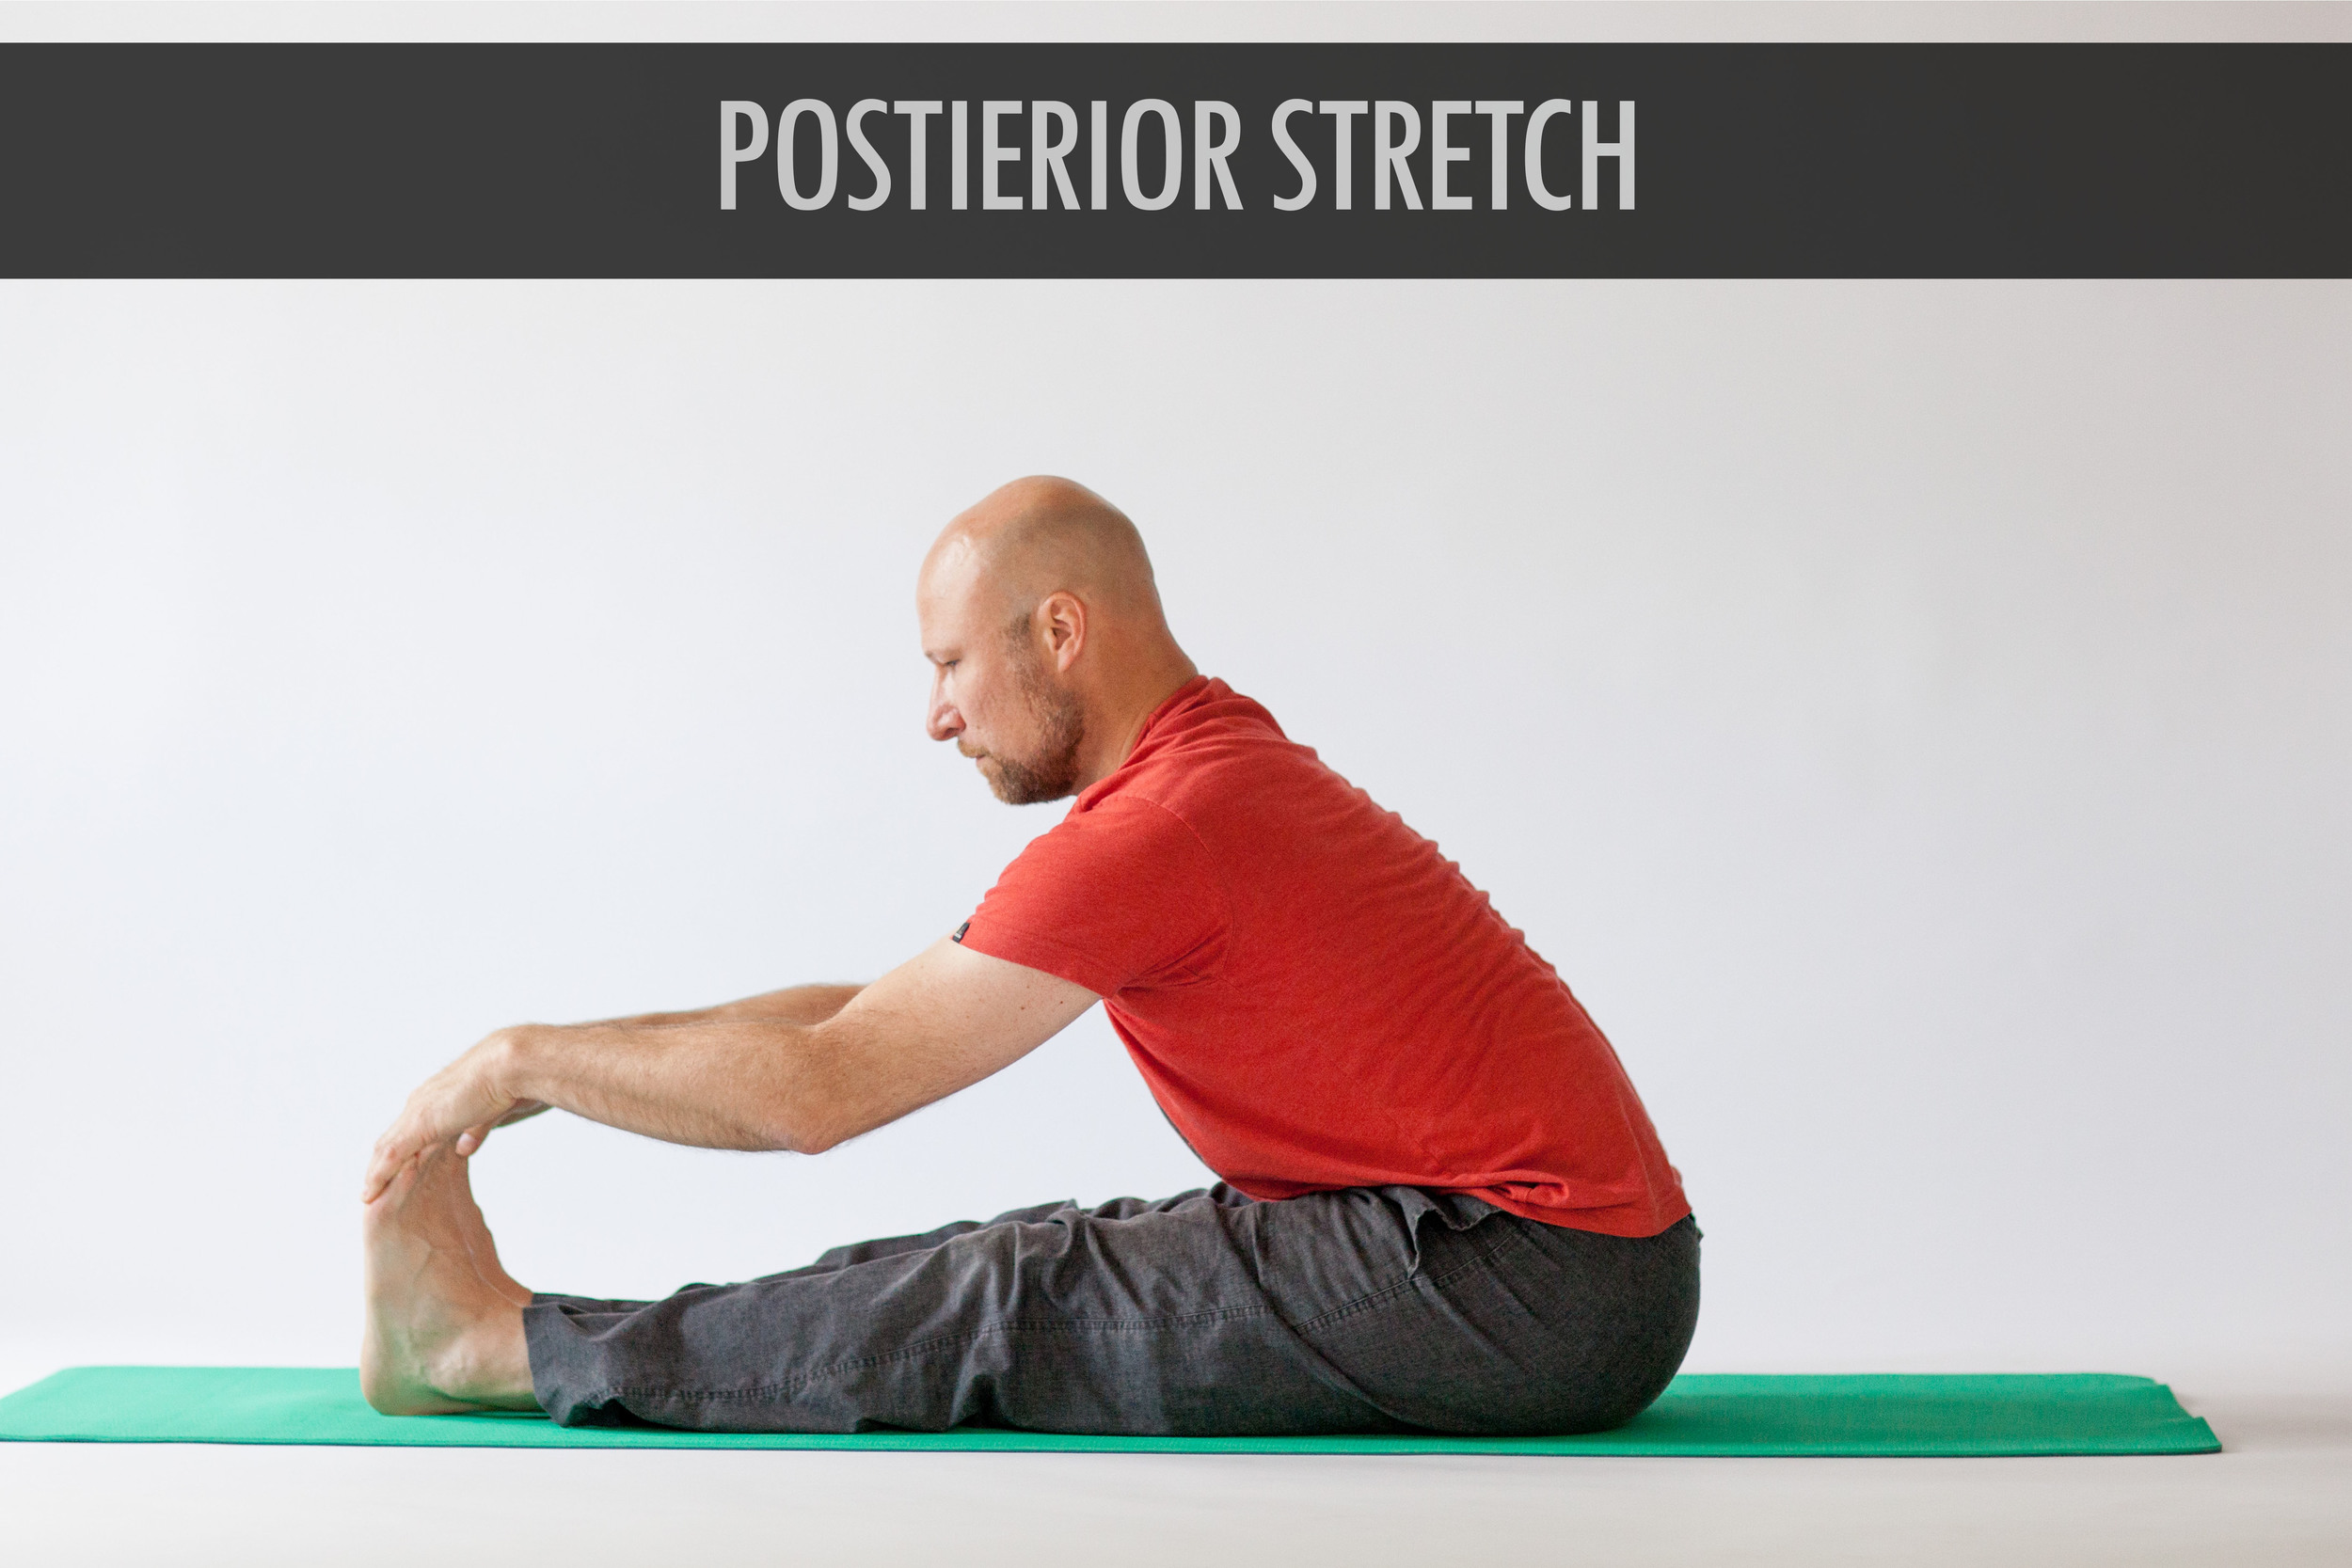 Postierior Stretch.jpg